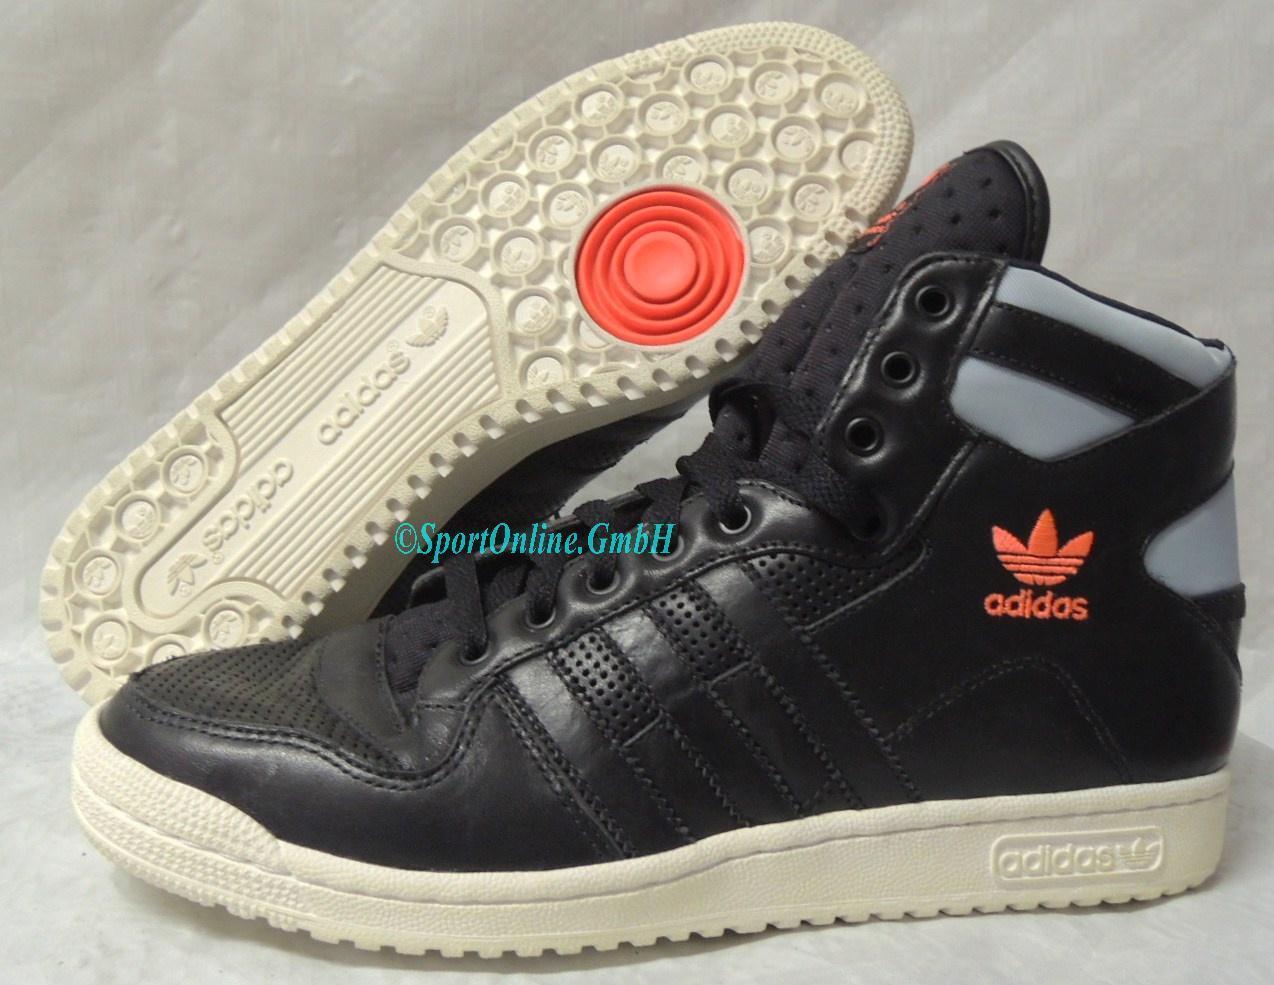 NEU adidas Decade Hi Größe 42 2/3 Herren Schuhe Sneaker Boots ORIGINALS G44186